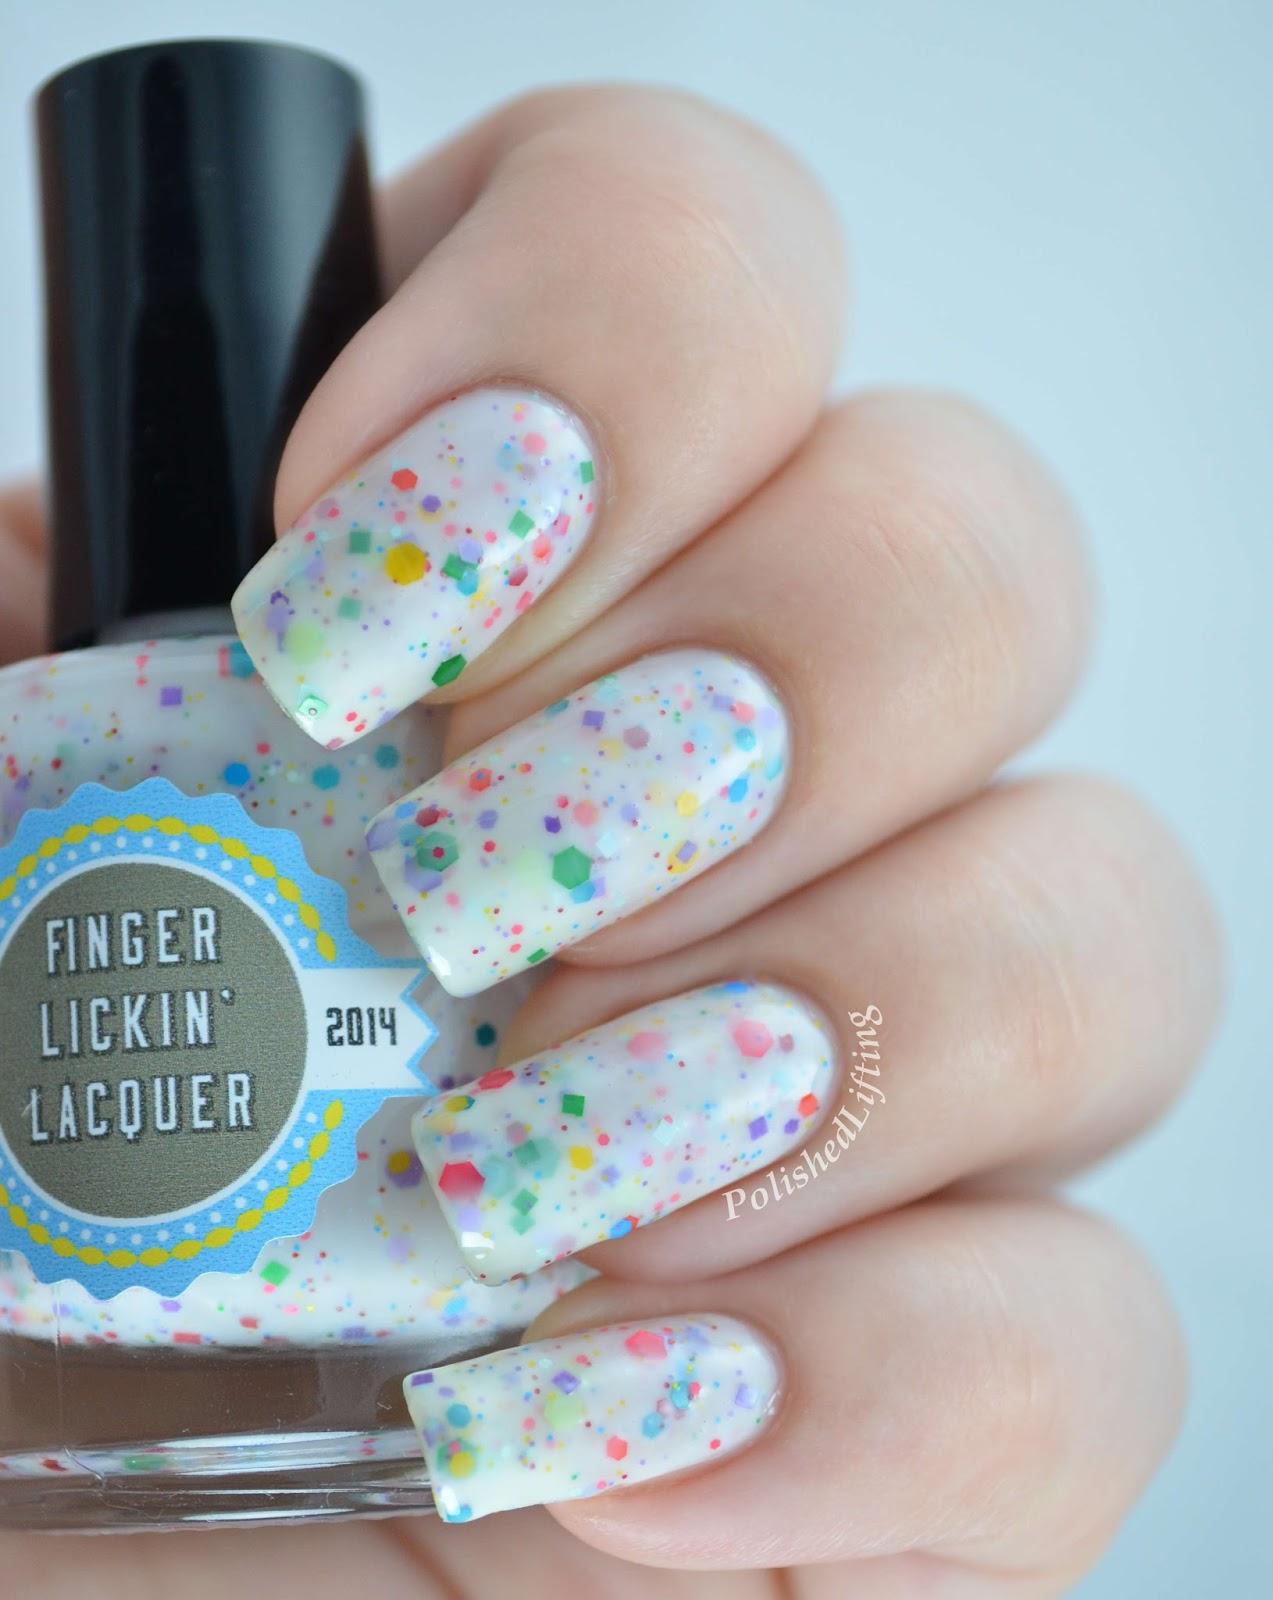 Finger Lickin' Lacquer Dunkacrelly Totally Rad